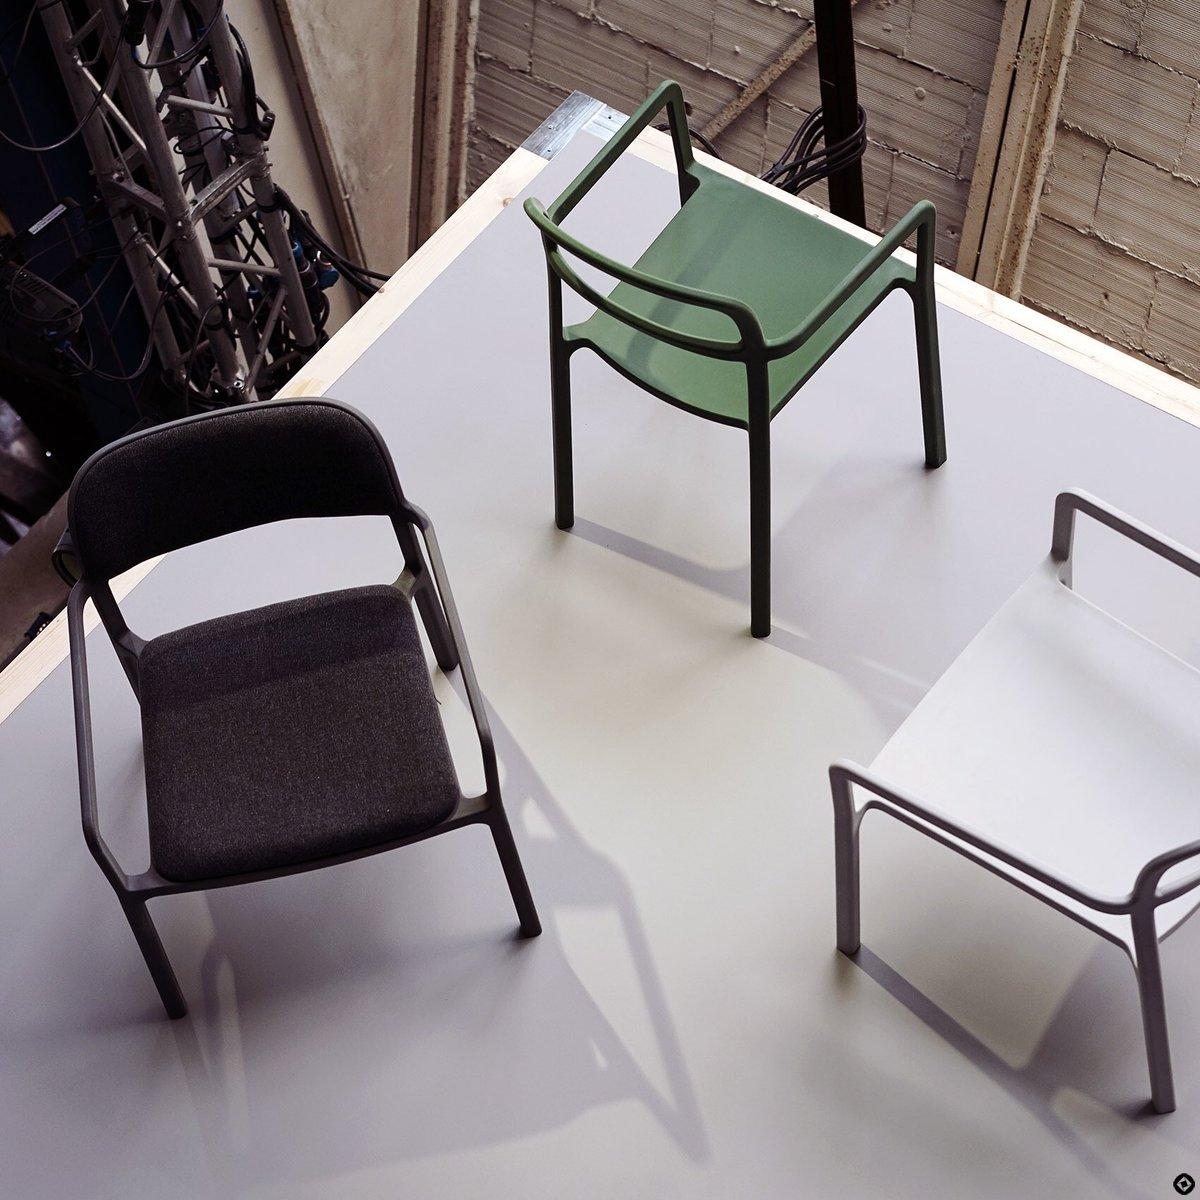 jo yana on twitter mdw17 ikea nouveautes 2017 2018 w coletteparis tomdixonstudio. Black Bedroom Furniture Sets. Home Design Ideas